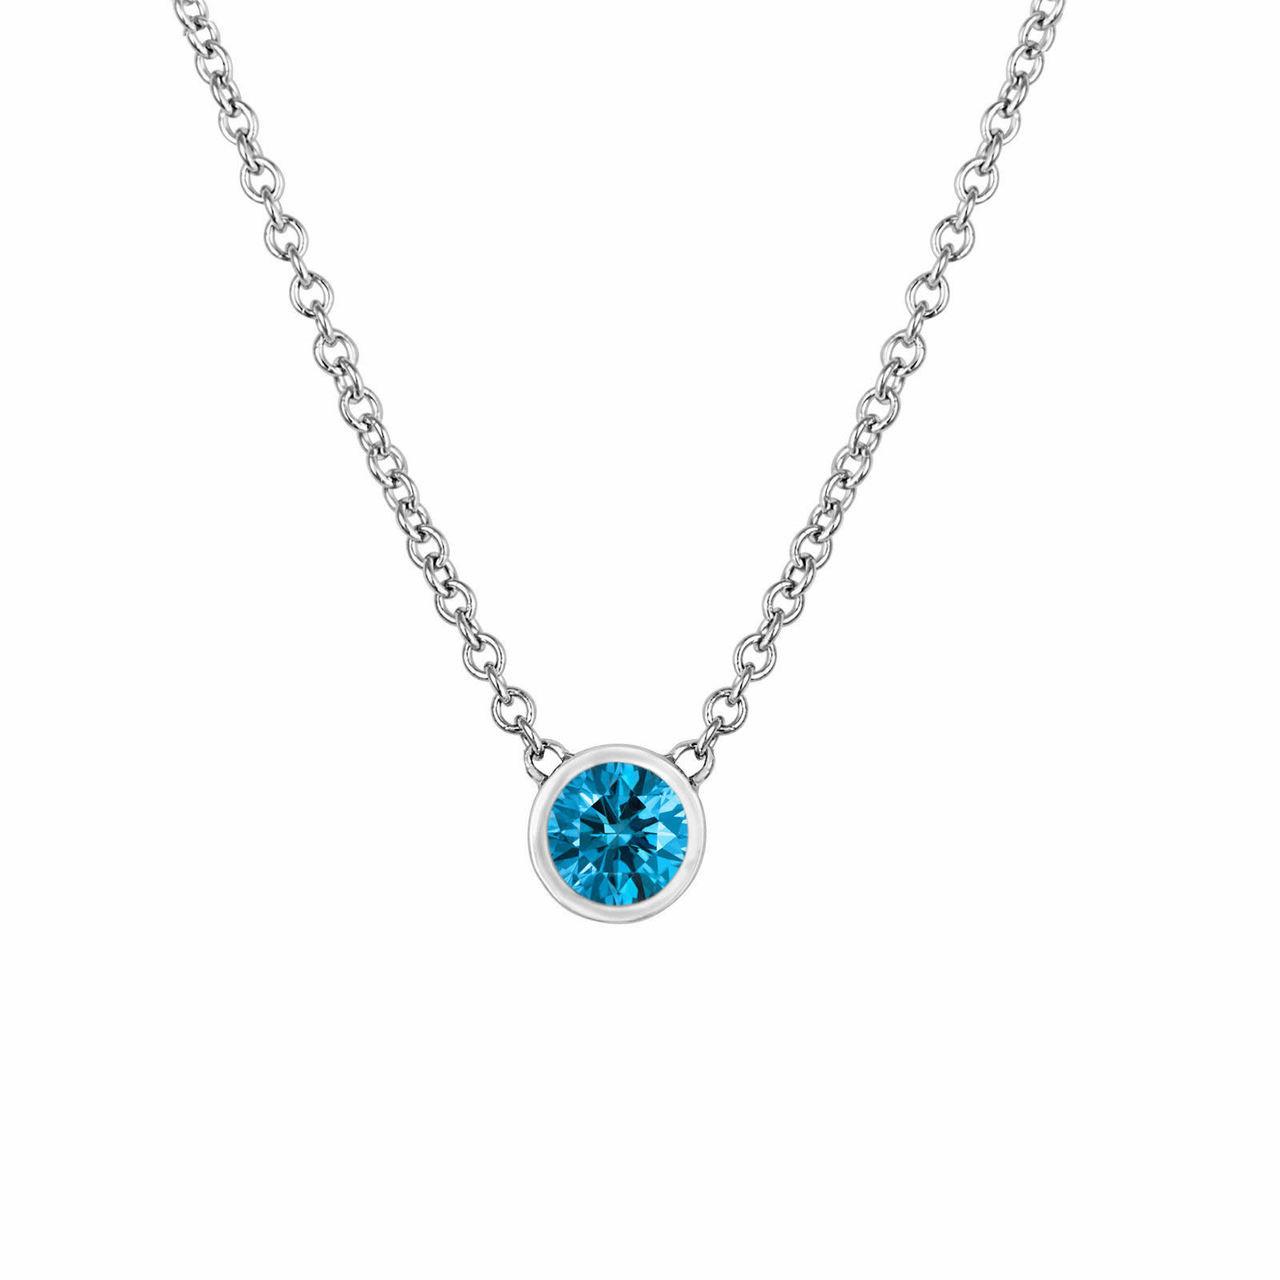 carat blue diamond pendant platinum diamond necklace. Black Bedroom Furniture Sets. Home Design Ideas